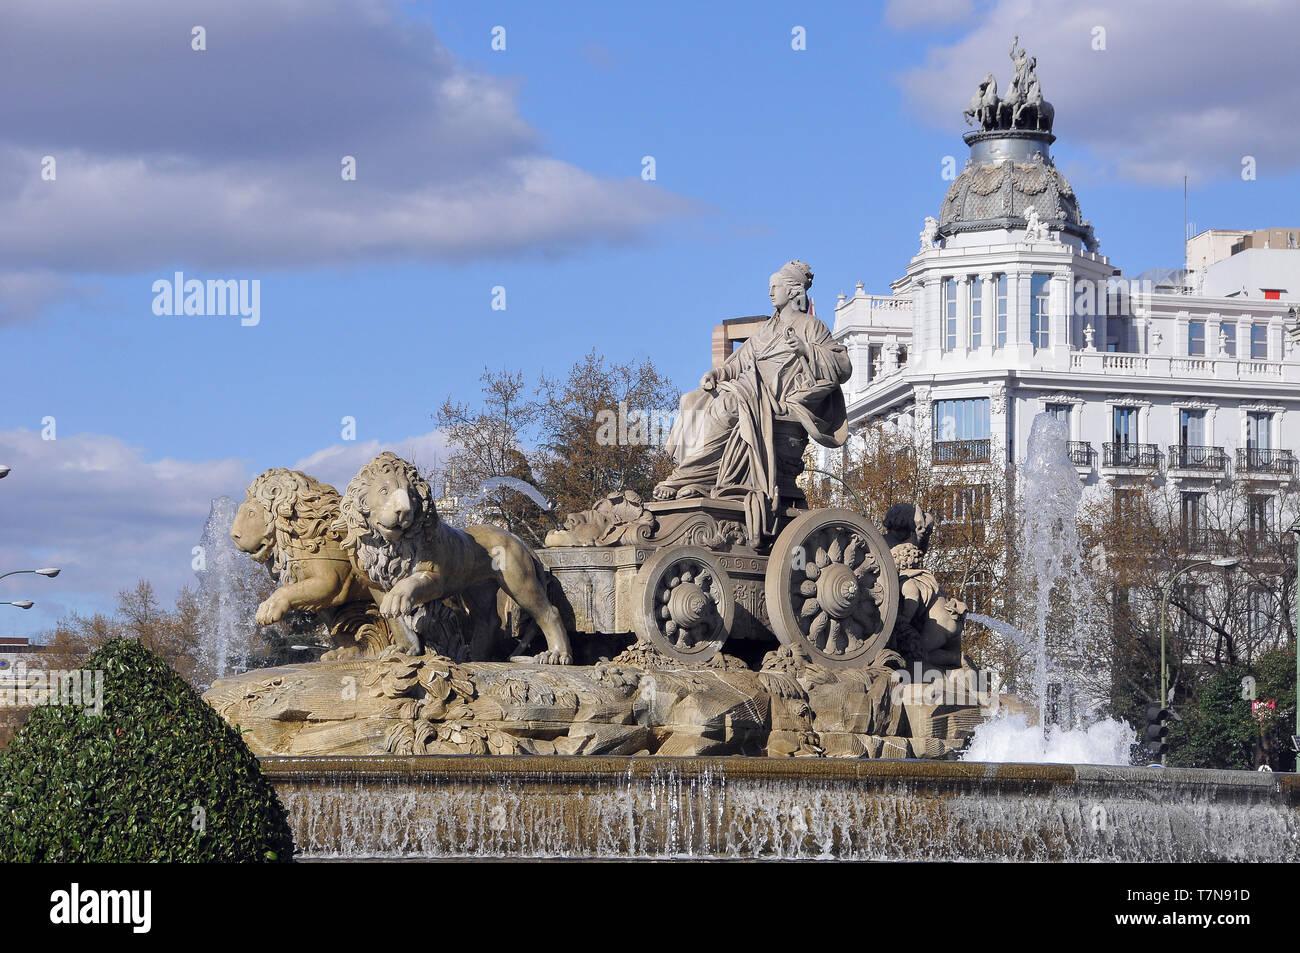 Fuente de Cibeles, Fountain of Cibeles, Madrid, Spain - Stock Image